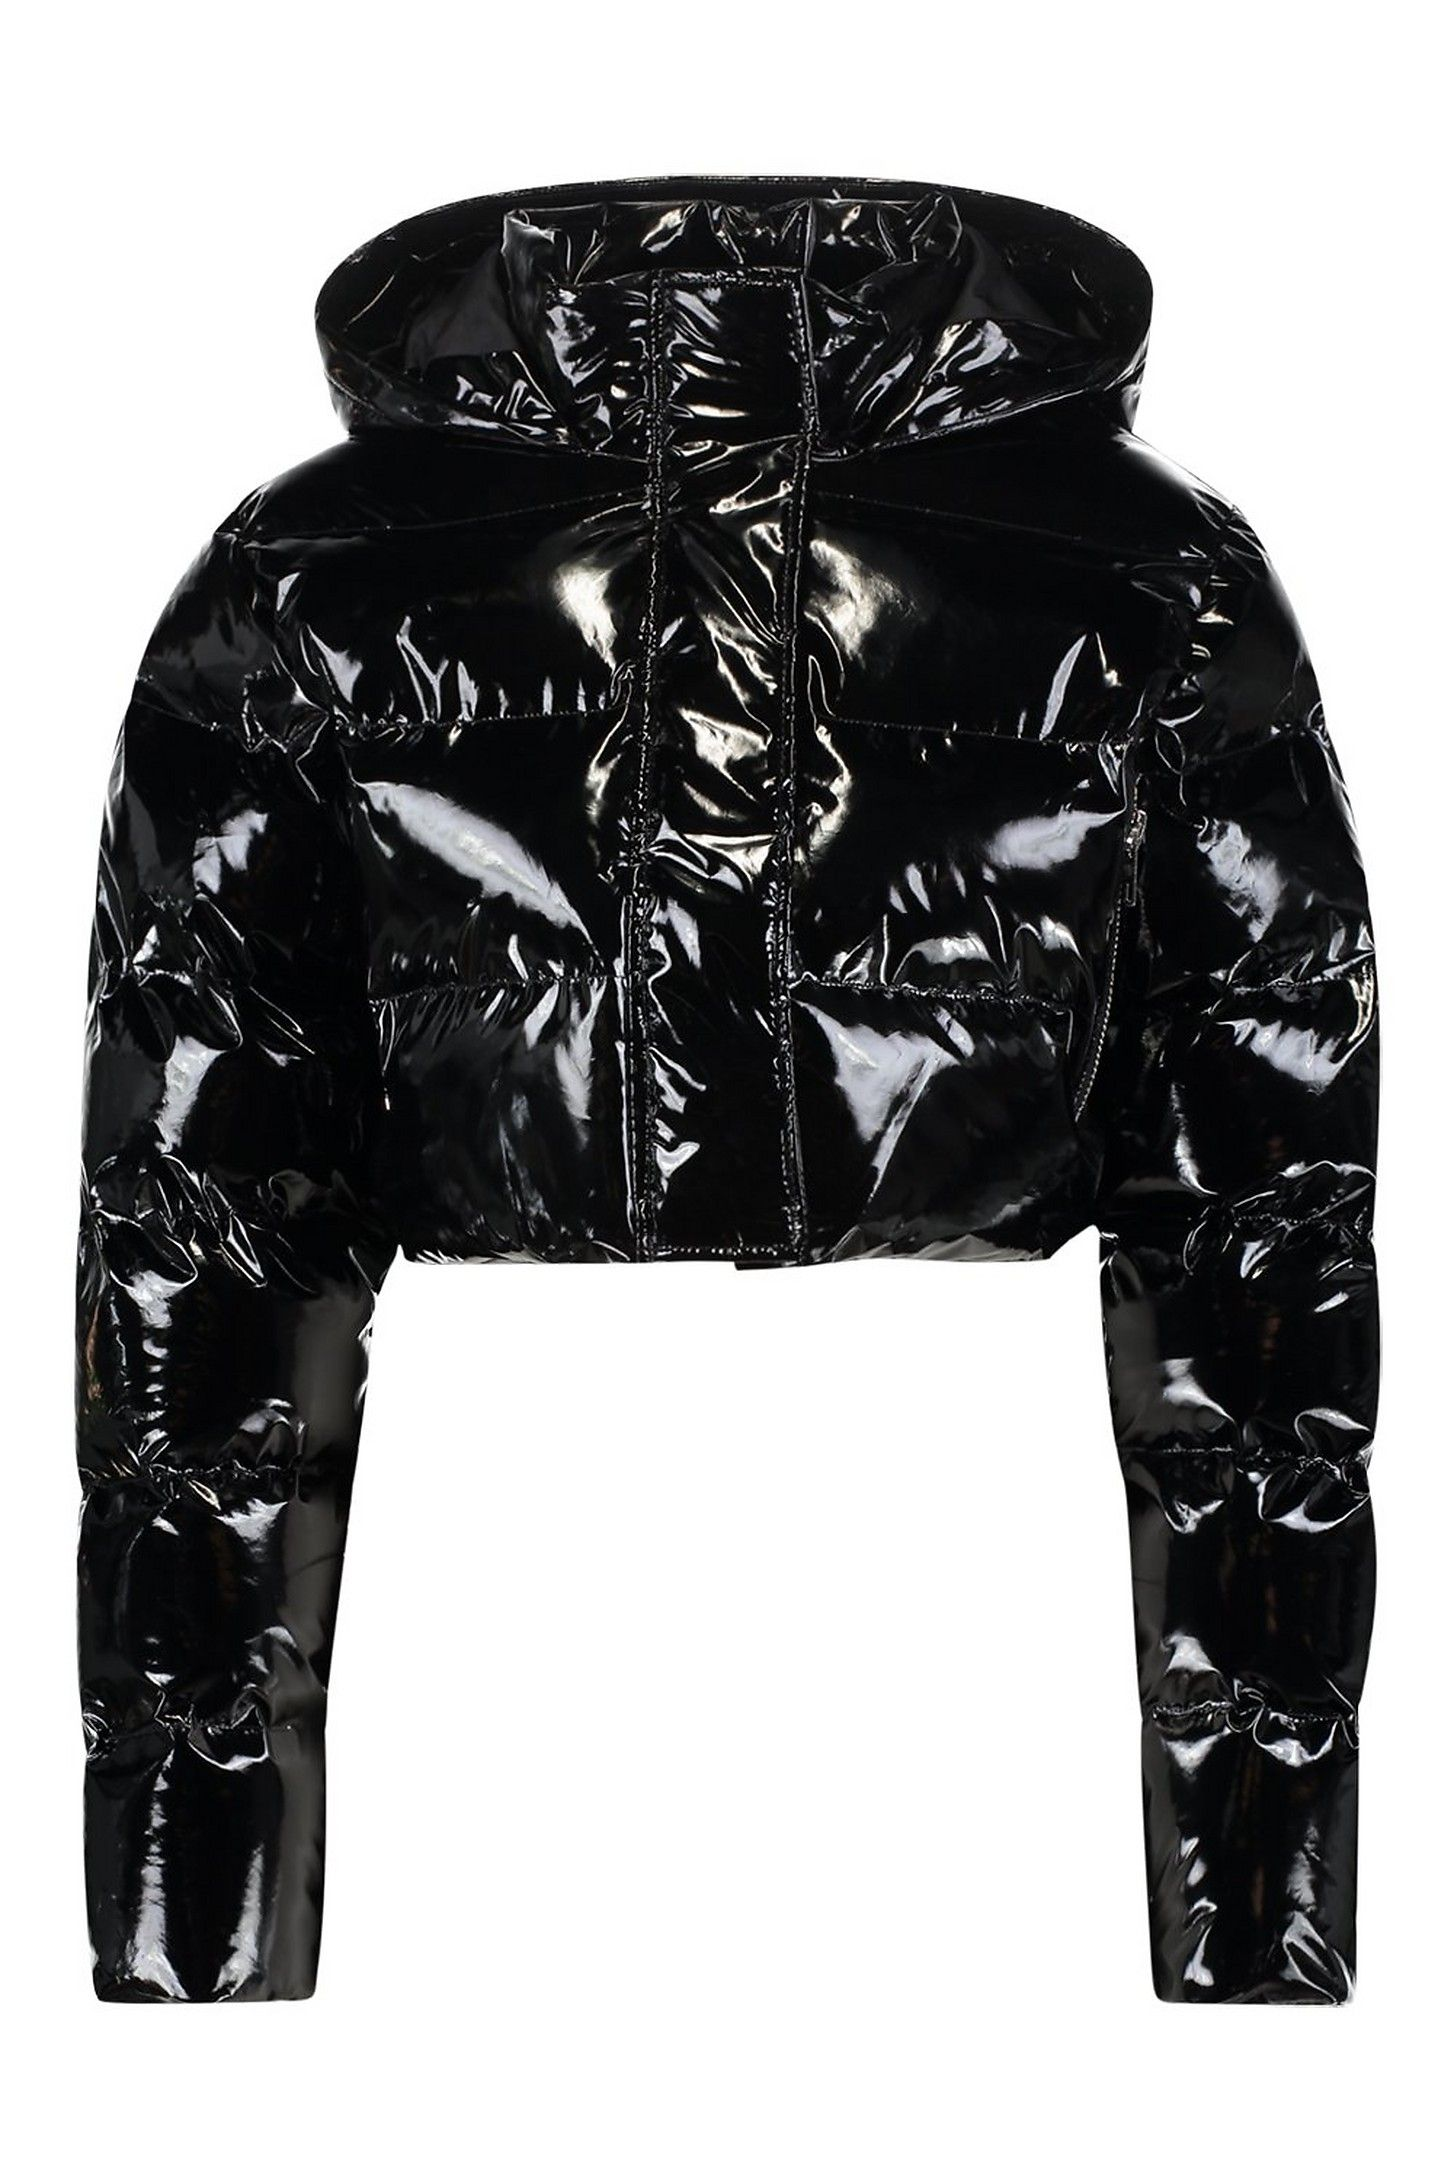 Crop Vinyl Puffer Jacket Boohoo Puffer Jacket Outfit Jackets Vinyl Clothing [ 2181 x 1454 Pixel ]